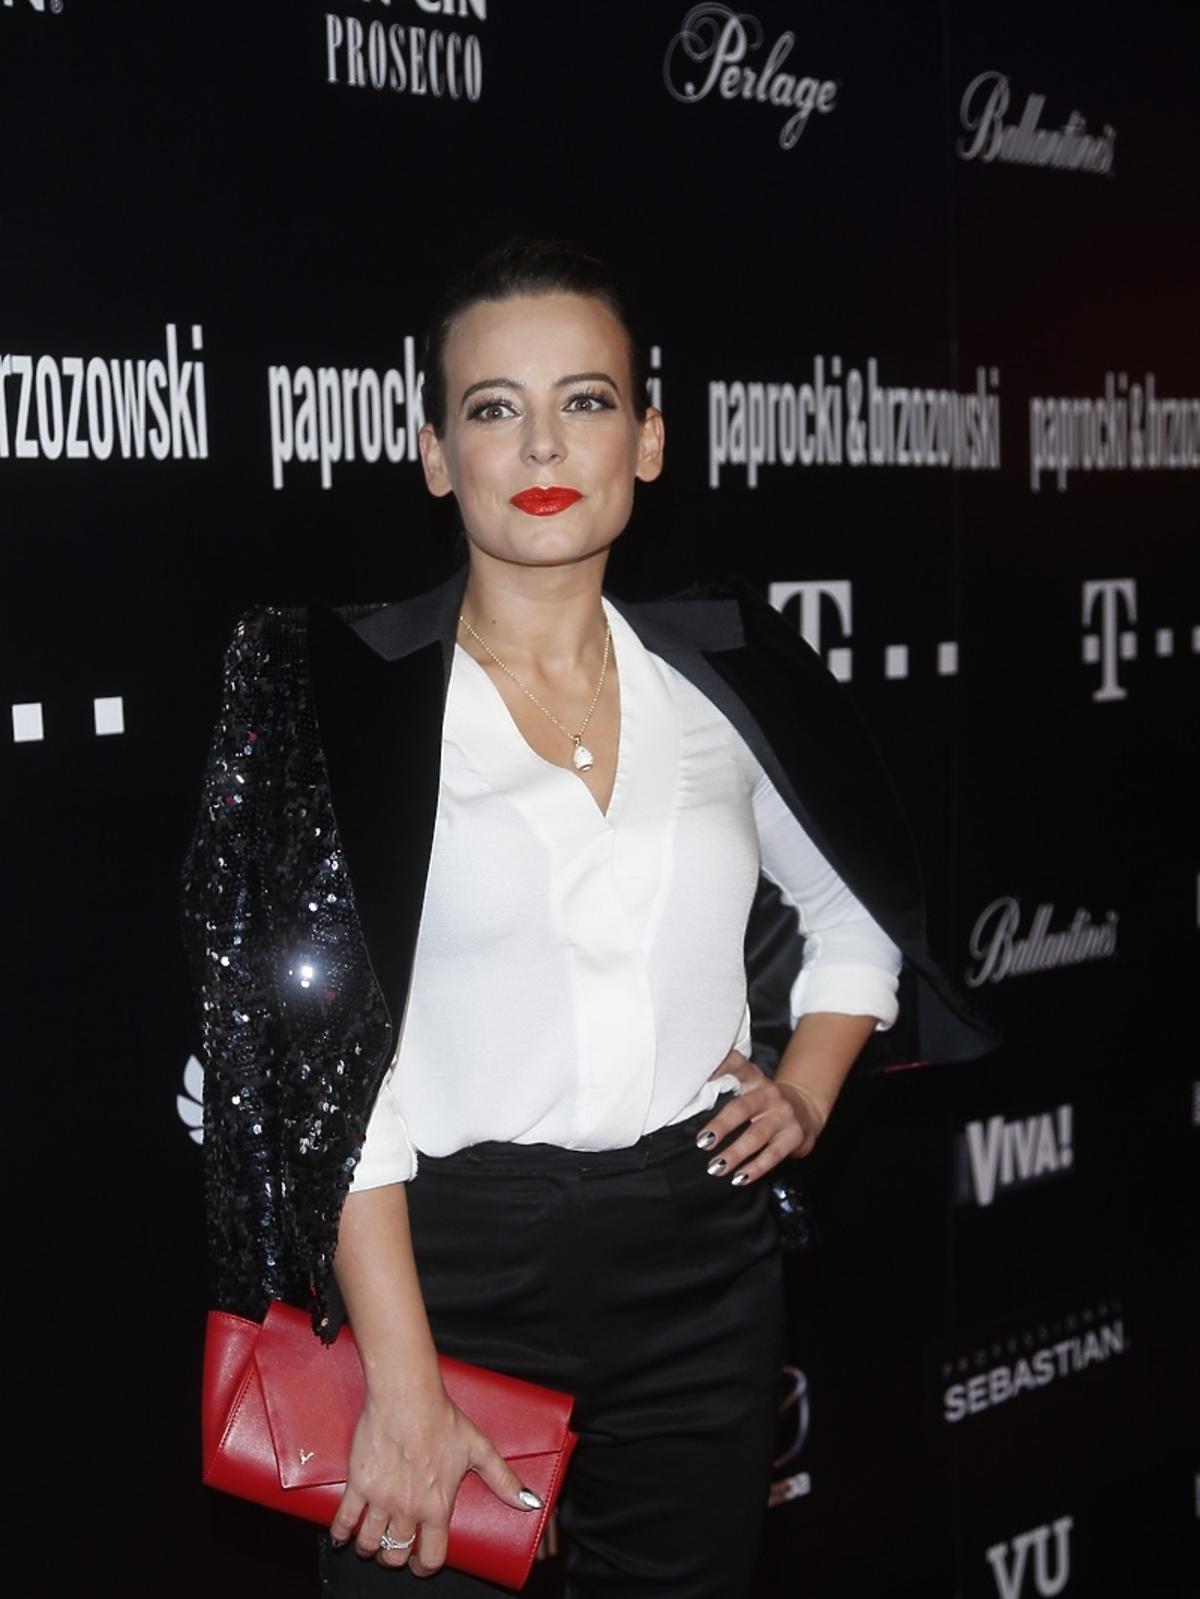 Anna Mucha na pokazie Paprocki&Brzozowski